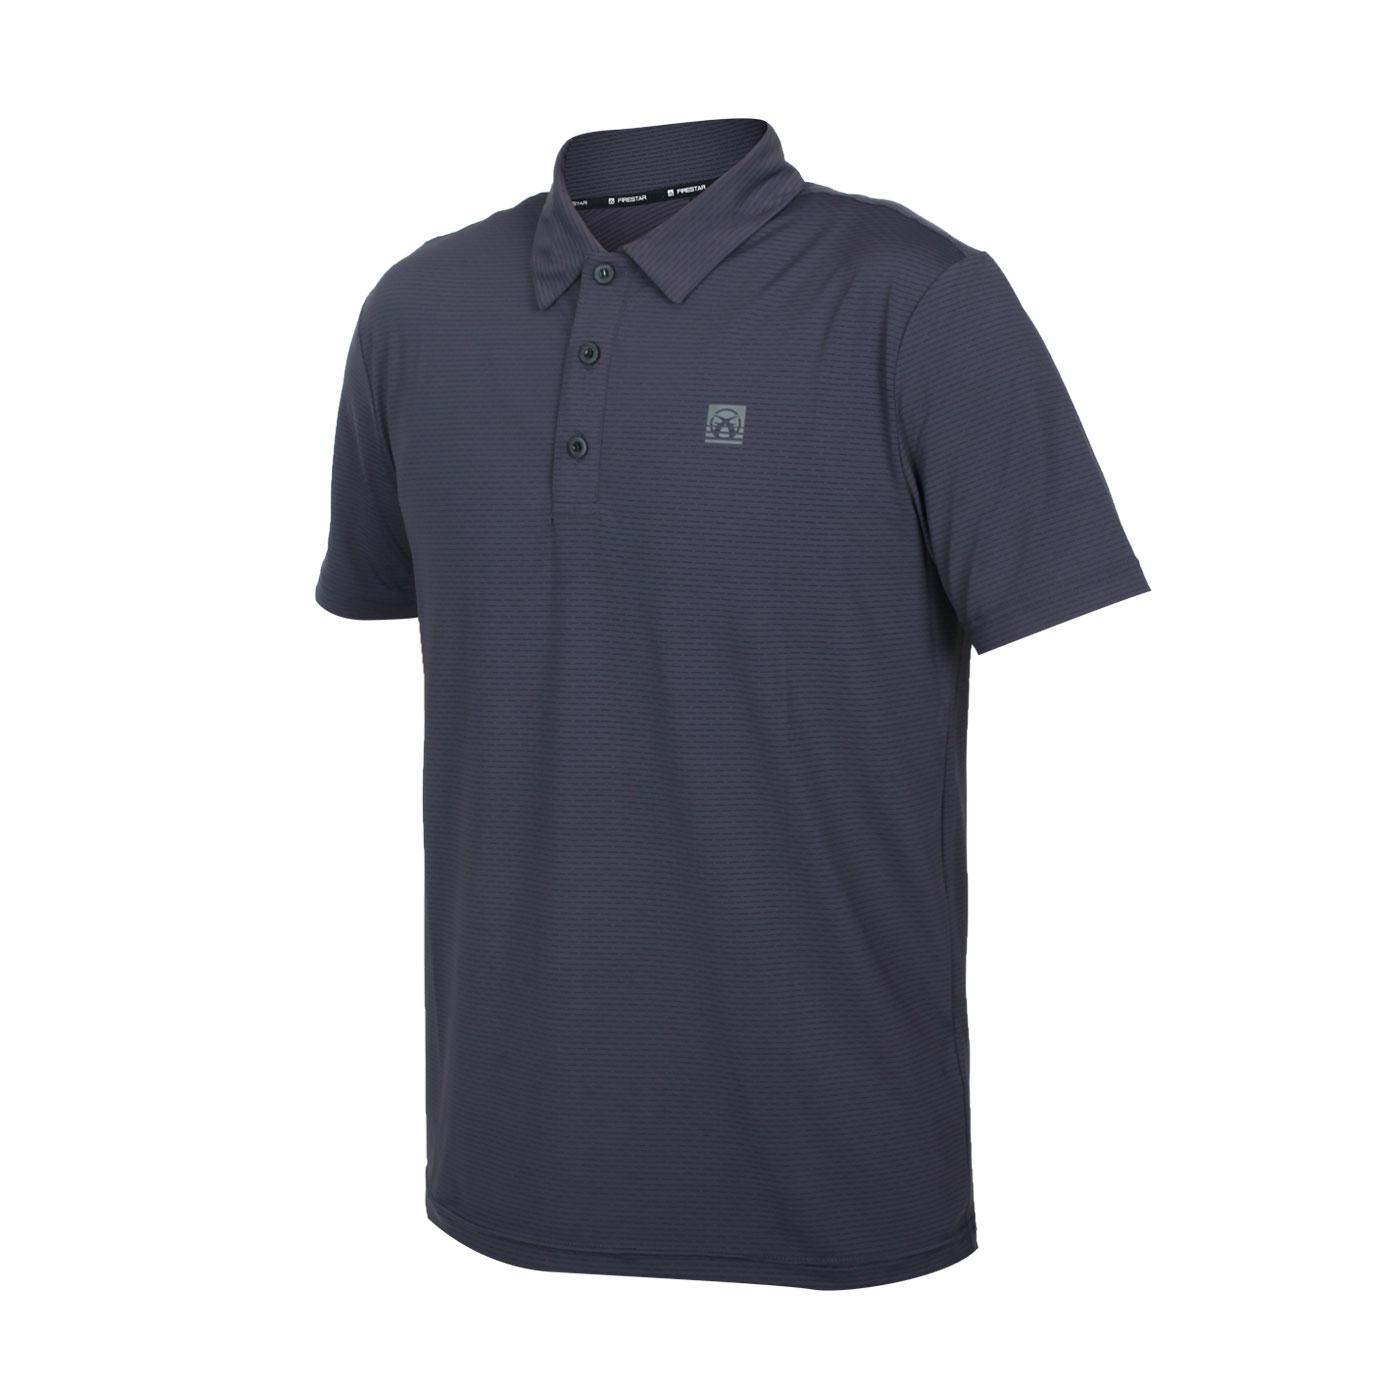 FIRESTAR 男款彈性機能短袖POLO衫 D1751-15 - 深灰